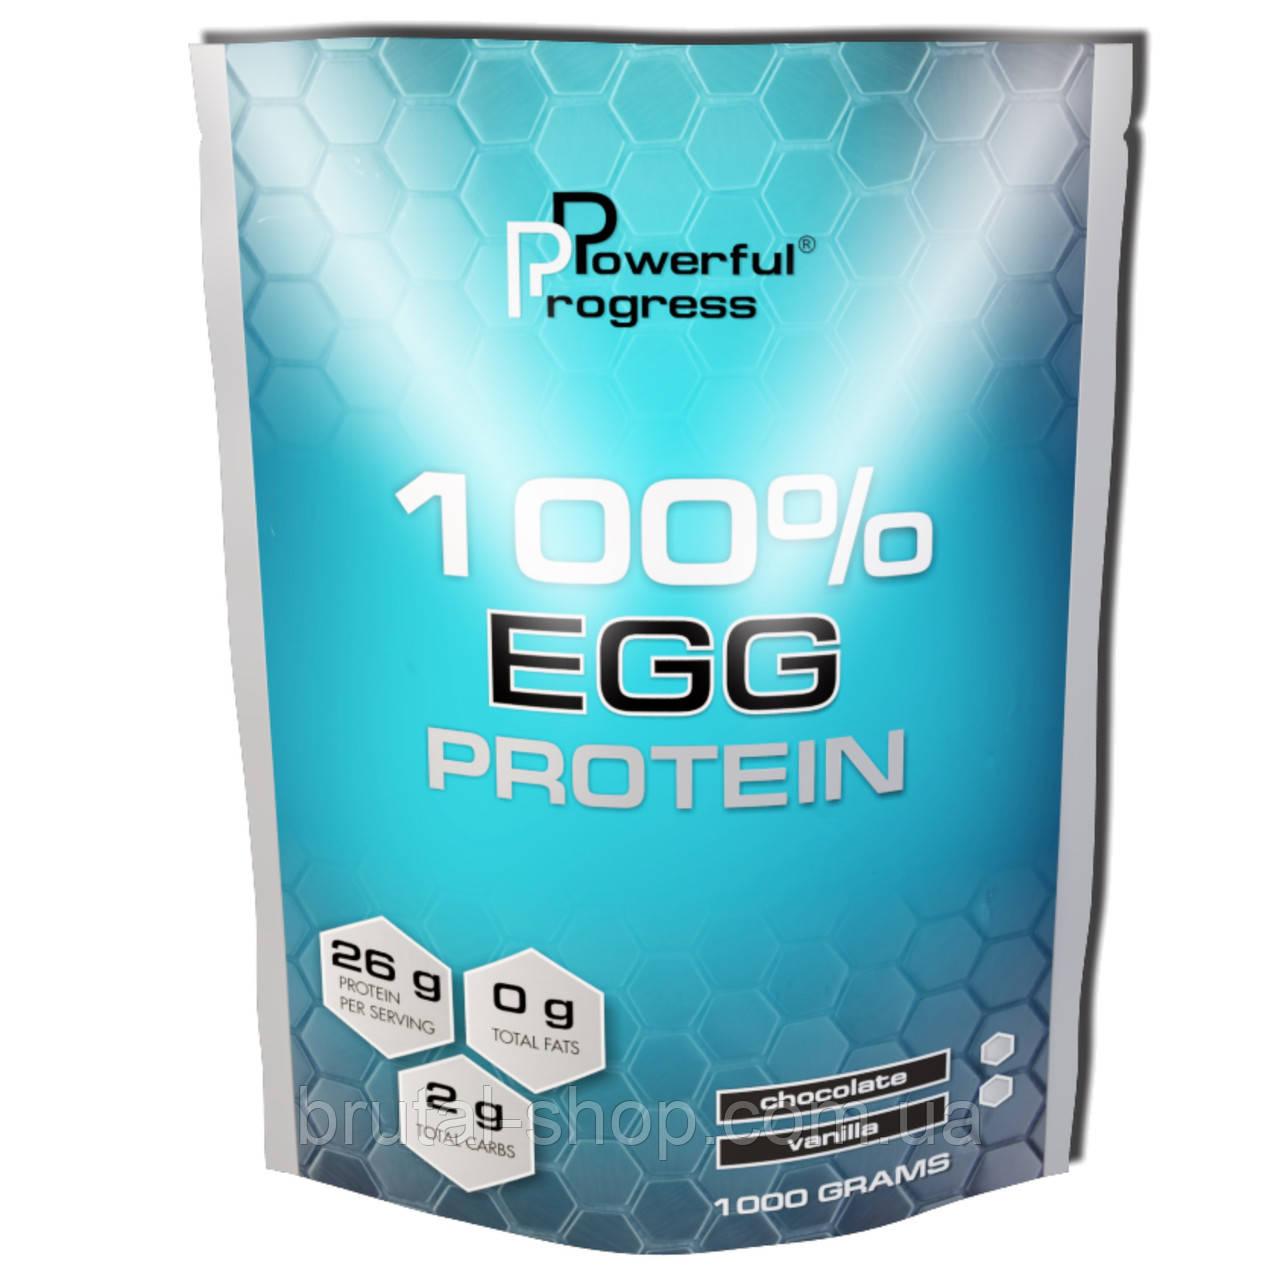 Powerful Progress 100% Egg Protein (1000g)